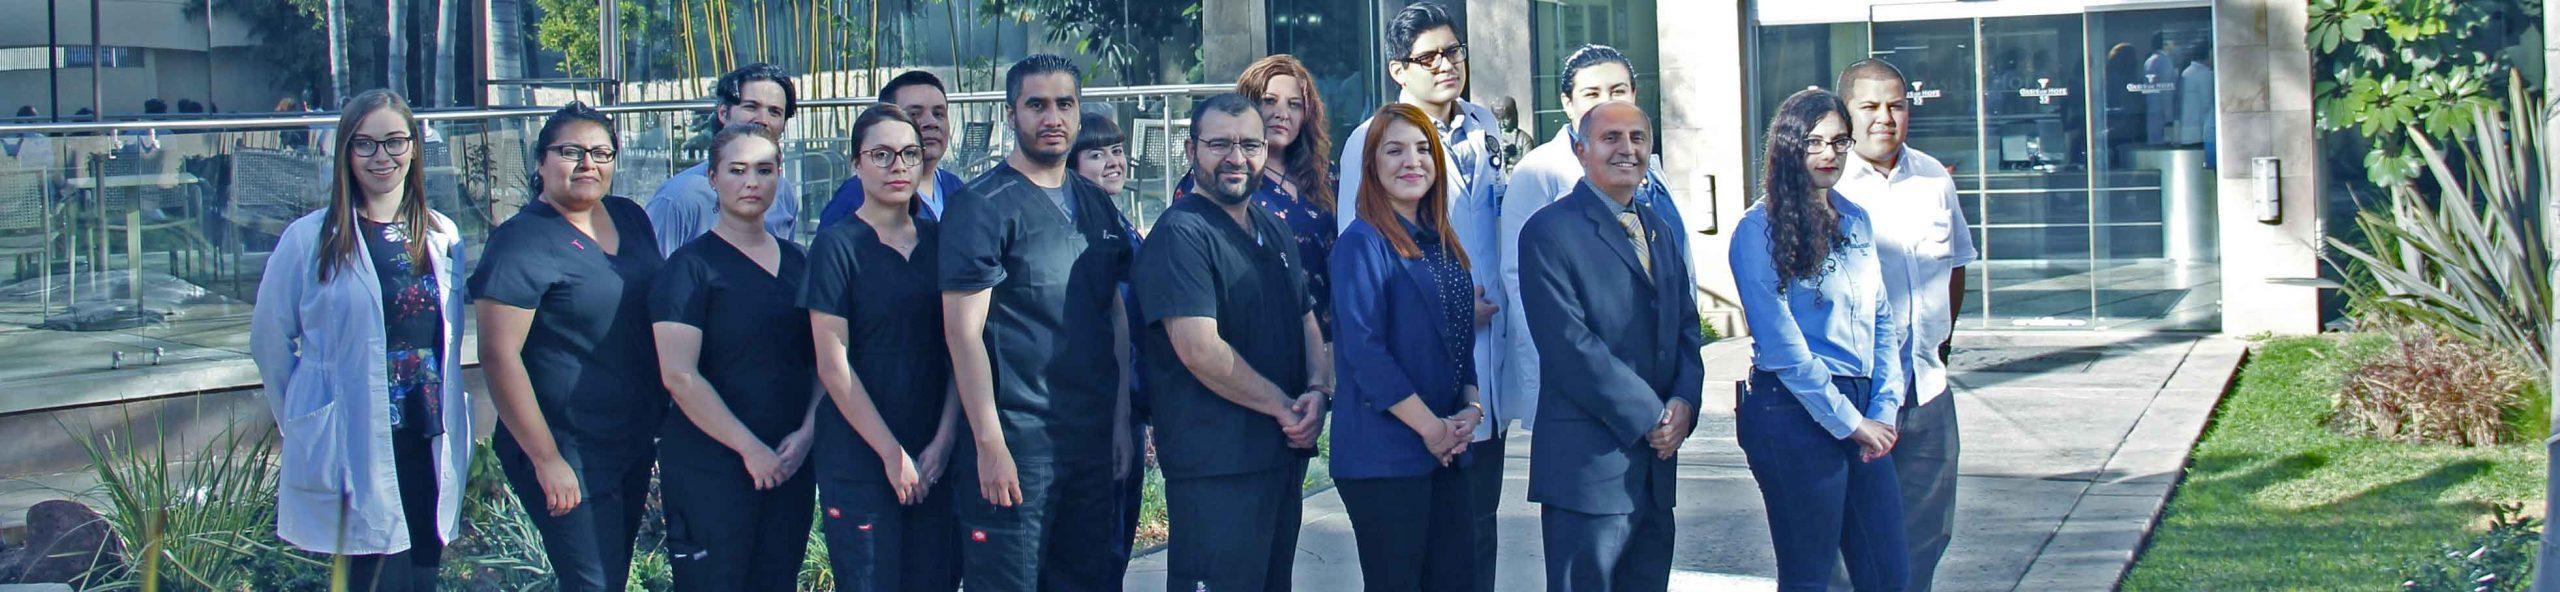 Mexico Bariatric Services - Bariatric Surgeons in Mexico